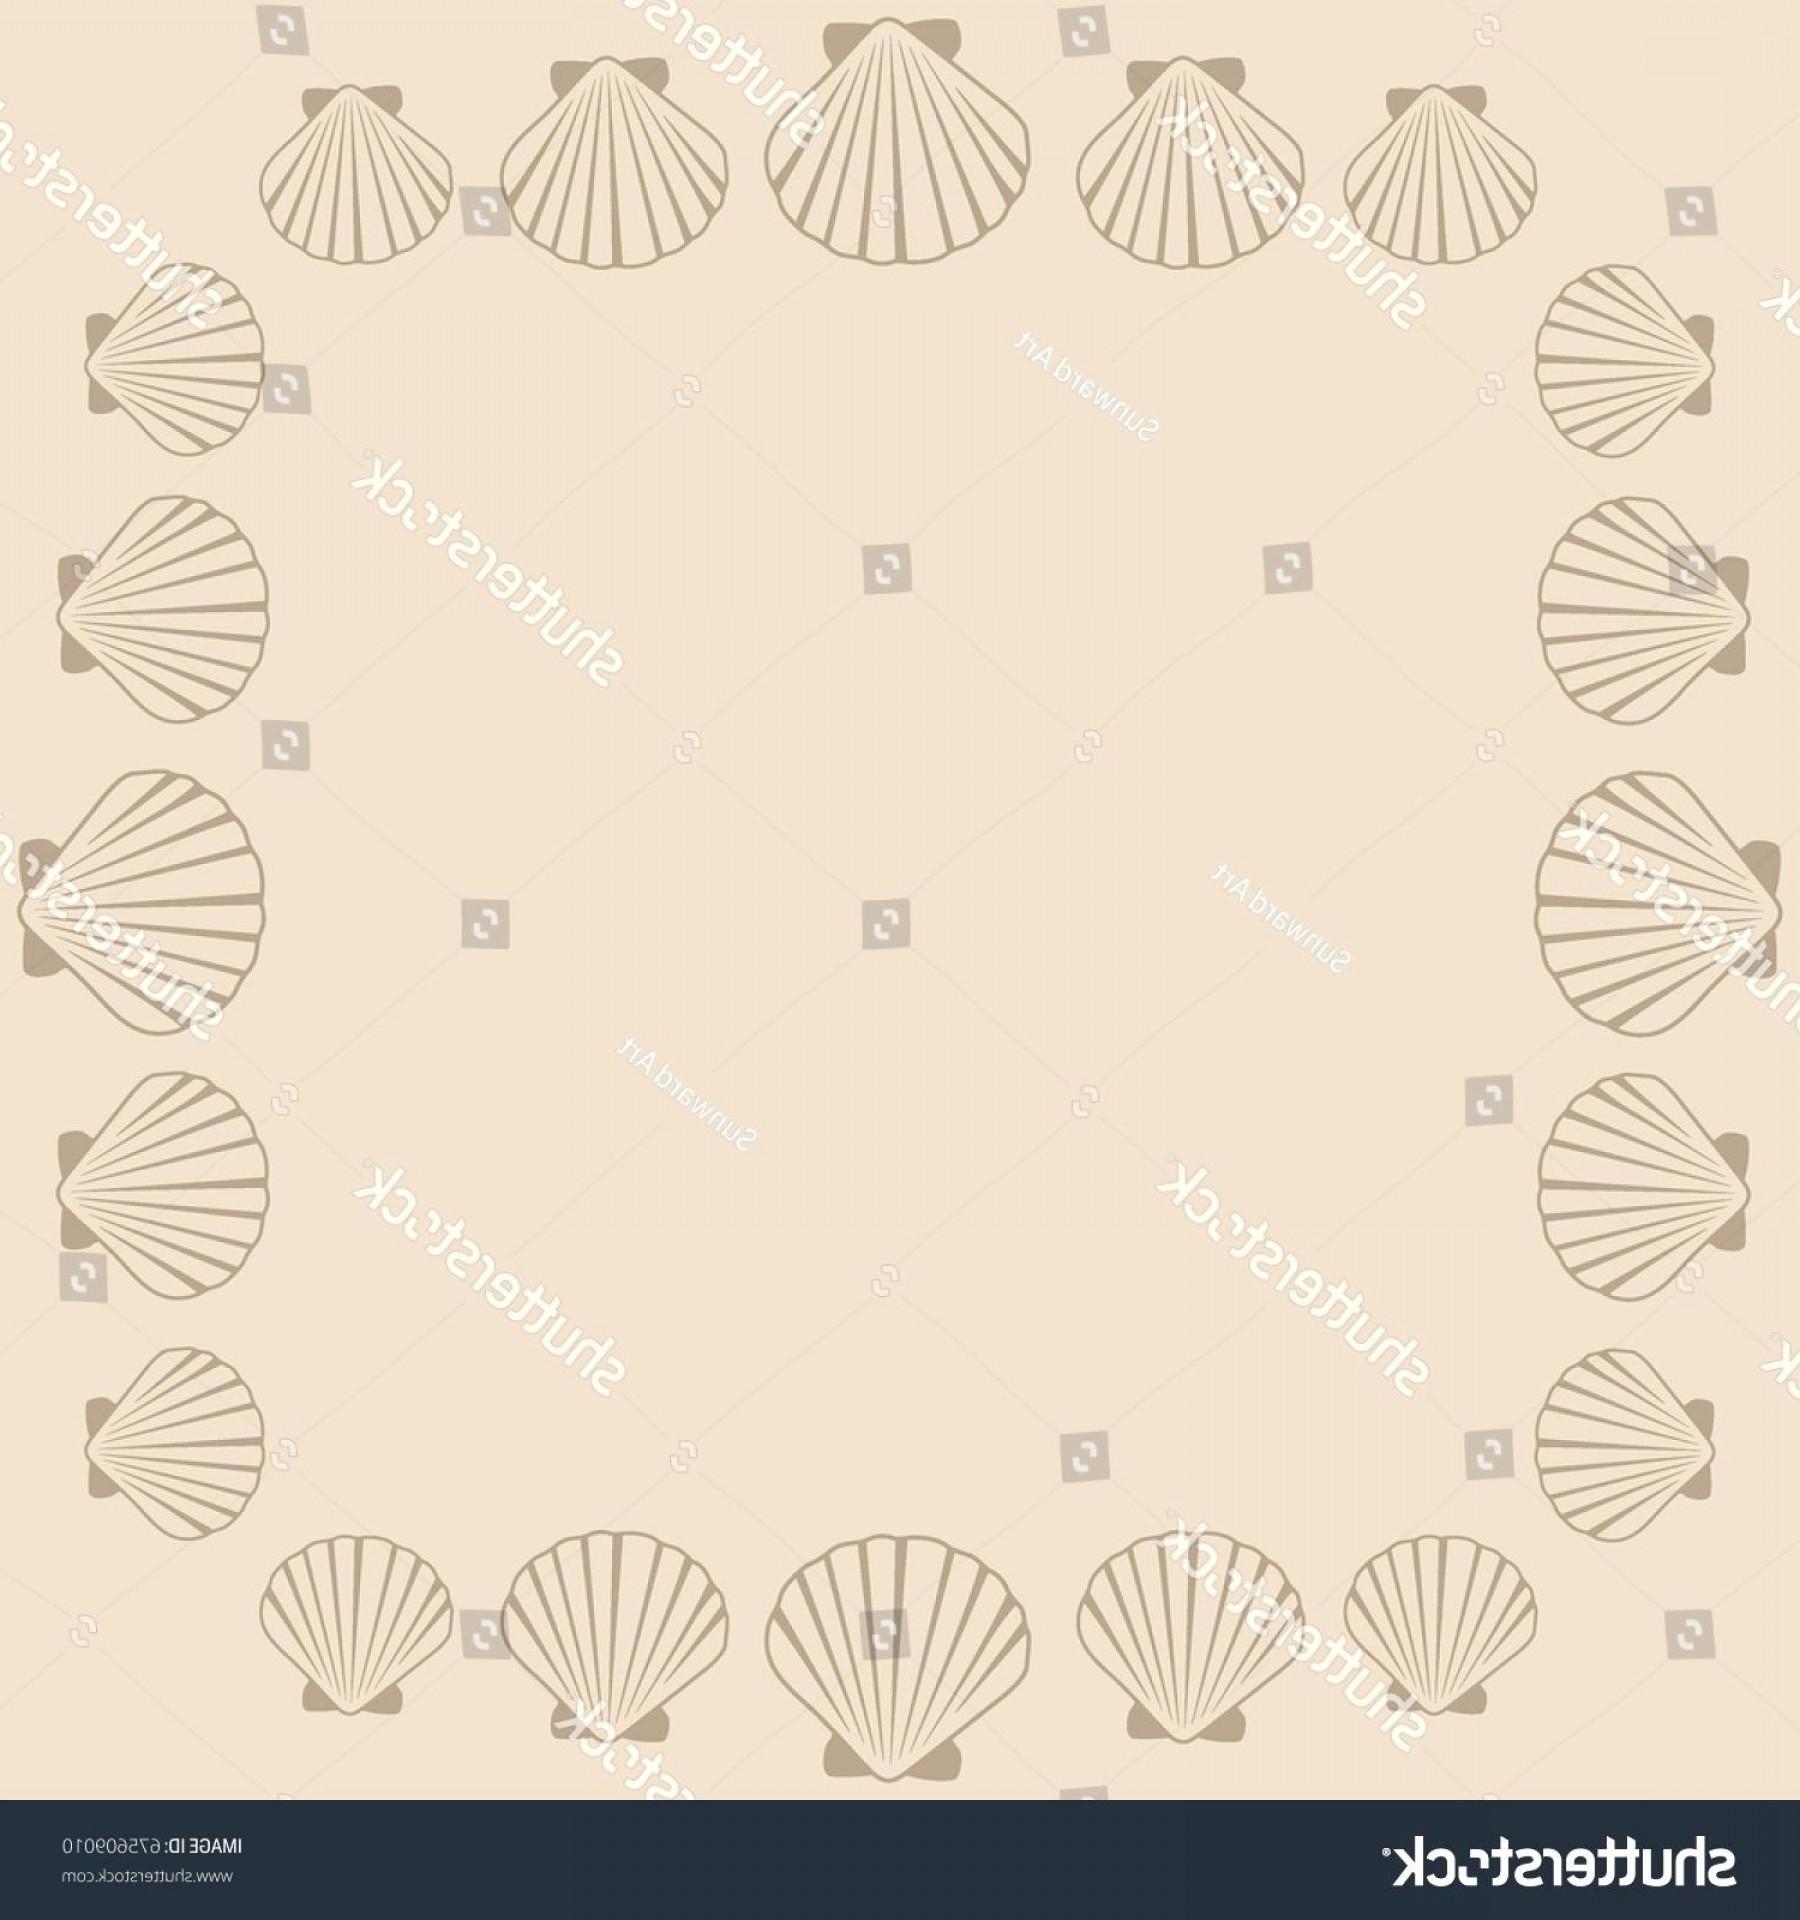 Seashell Wallpaper 66 Images